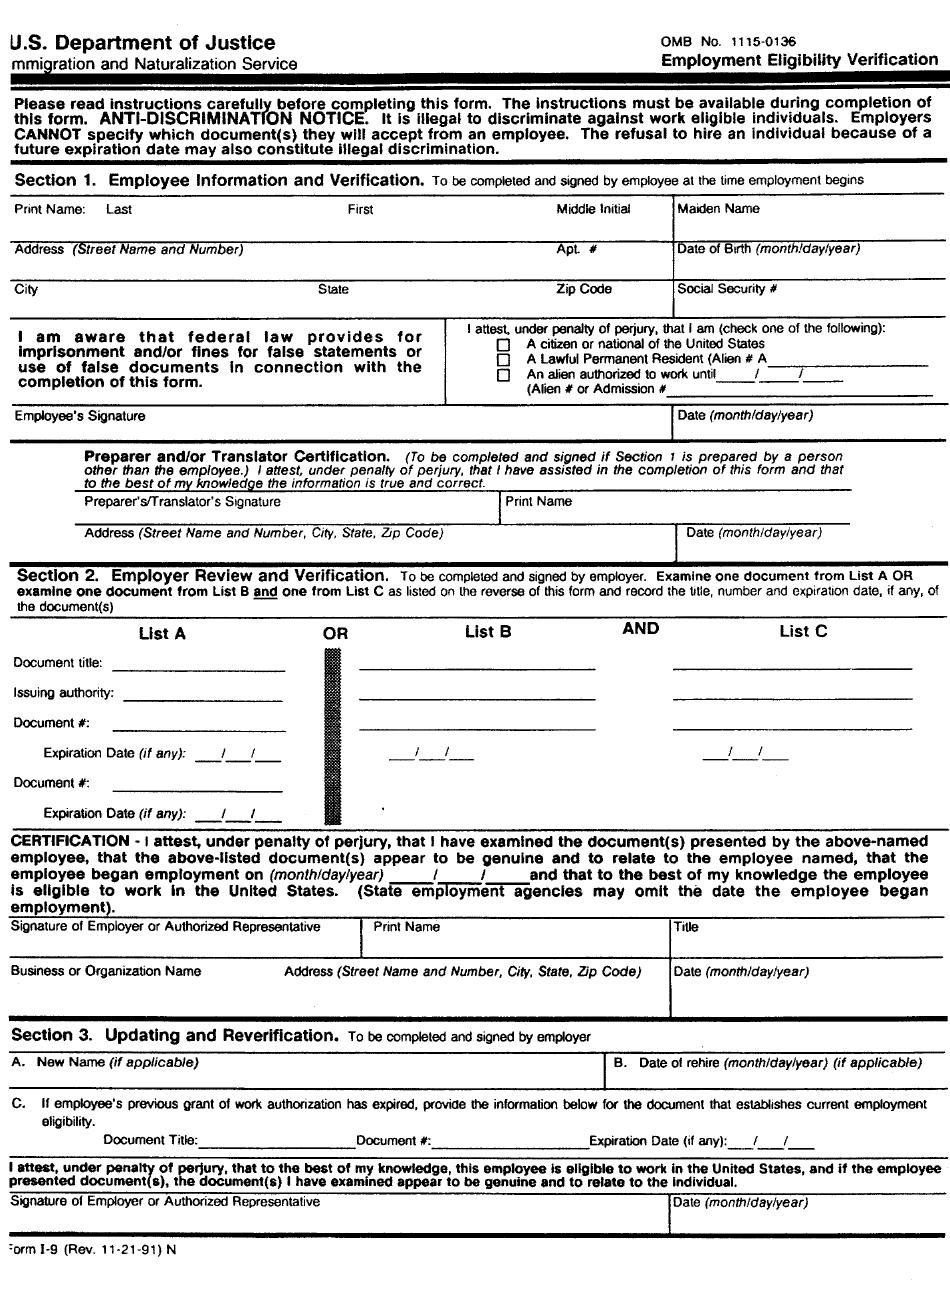 Form I-9 - Employment Eligibility Verification - U.s.